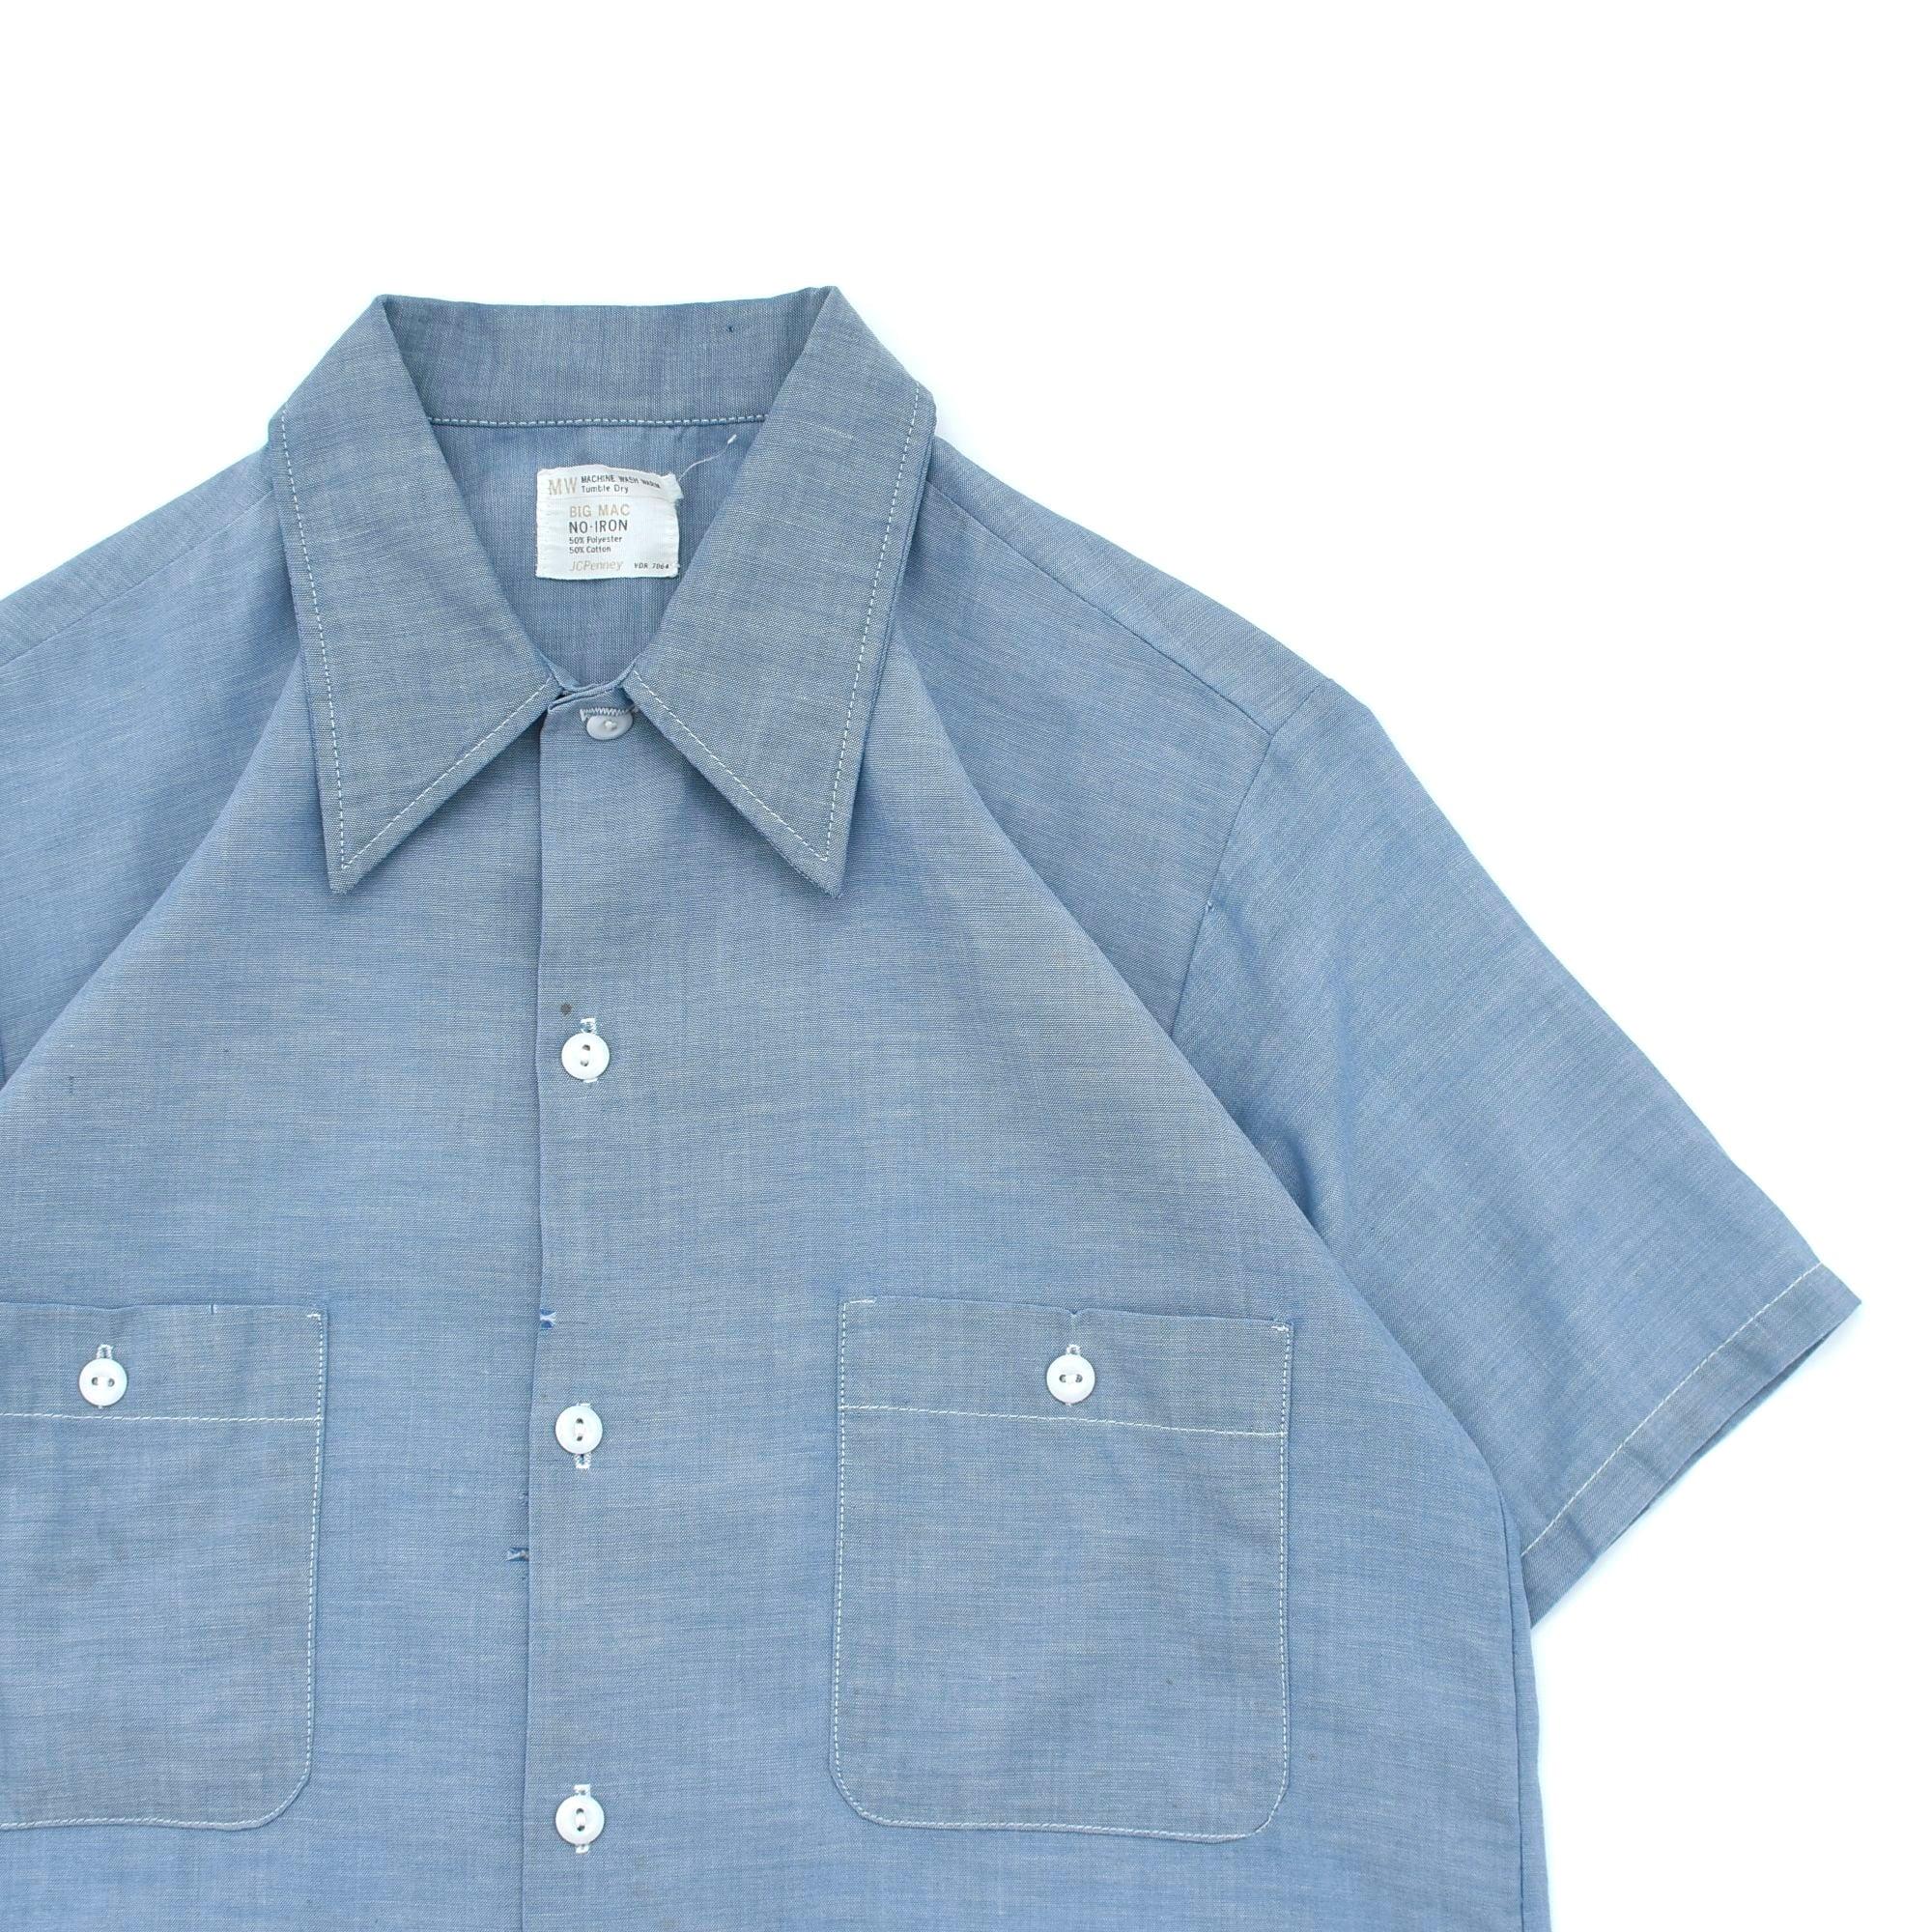 70's BIG MAC chambray work shirt